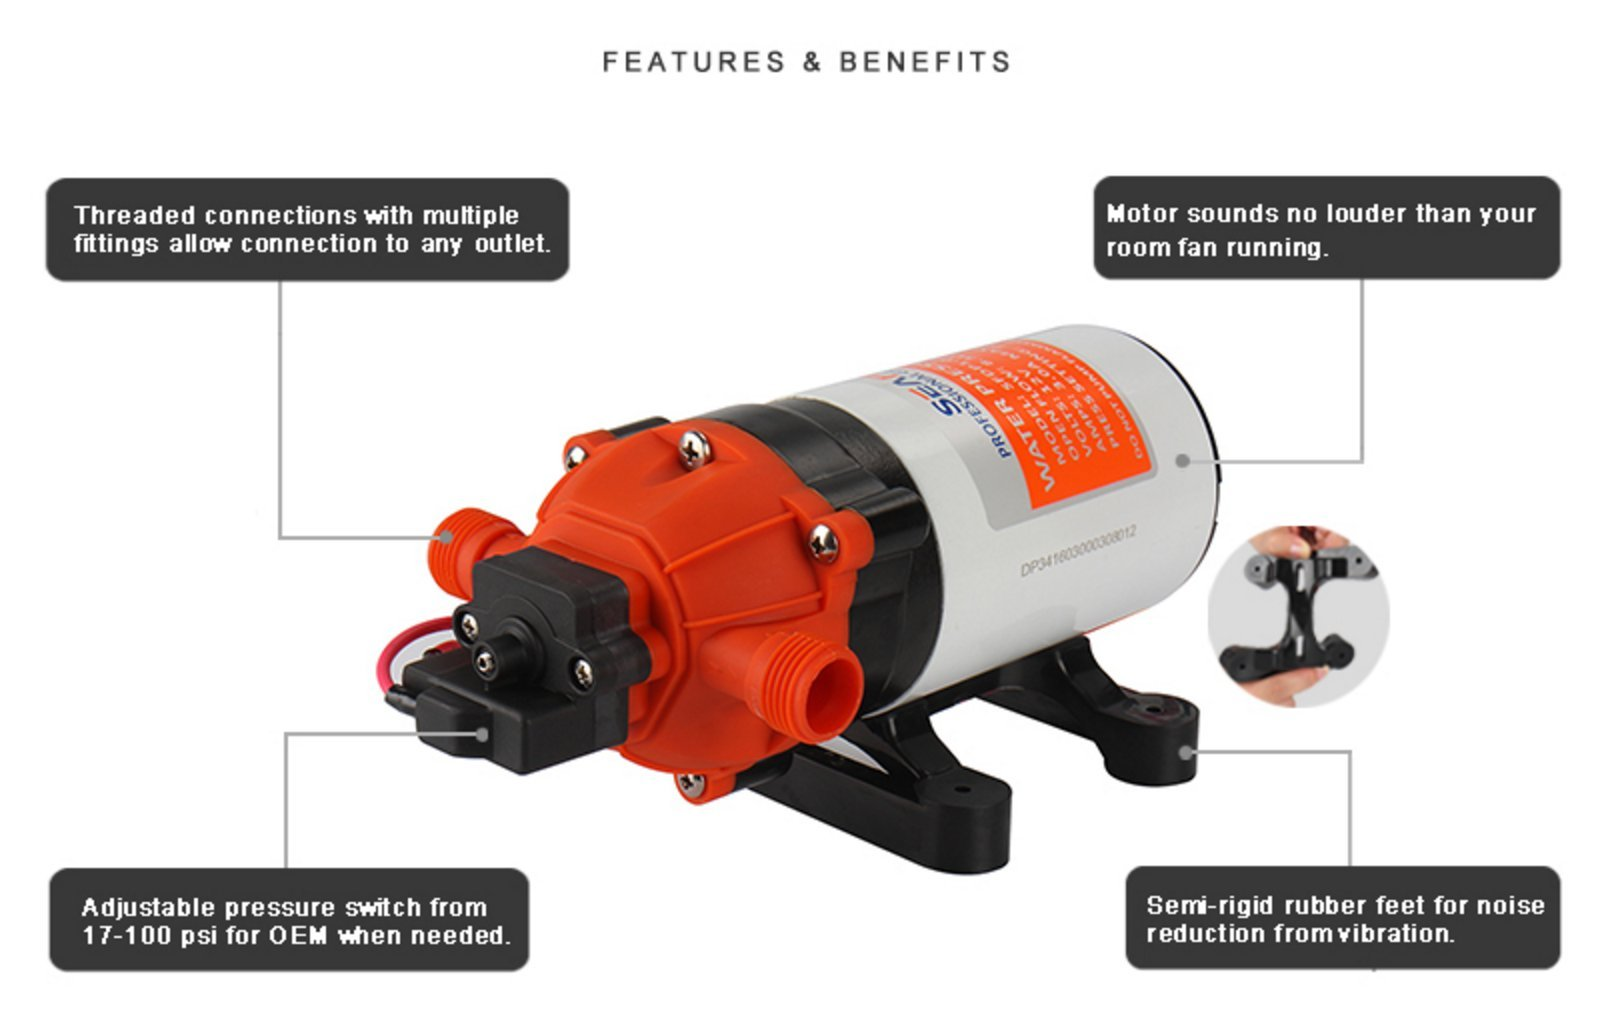 SEAFLO 12V 1.6 GPM 100 PSI 34-Series Water Pressure Diaphragm Pump by Seaflo (Image #5)